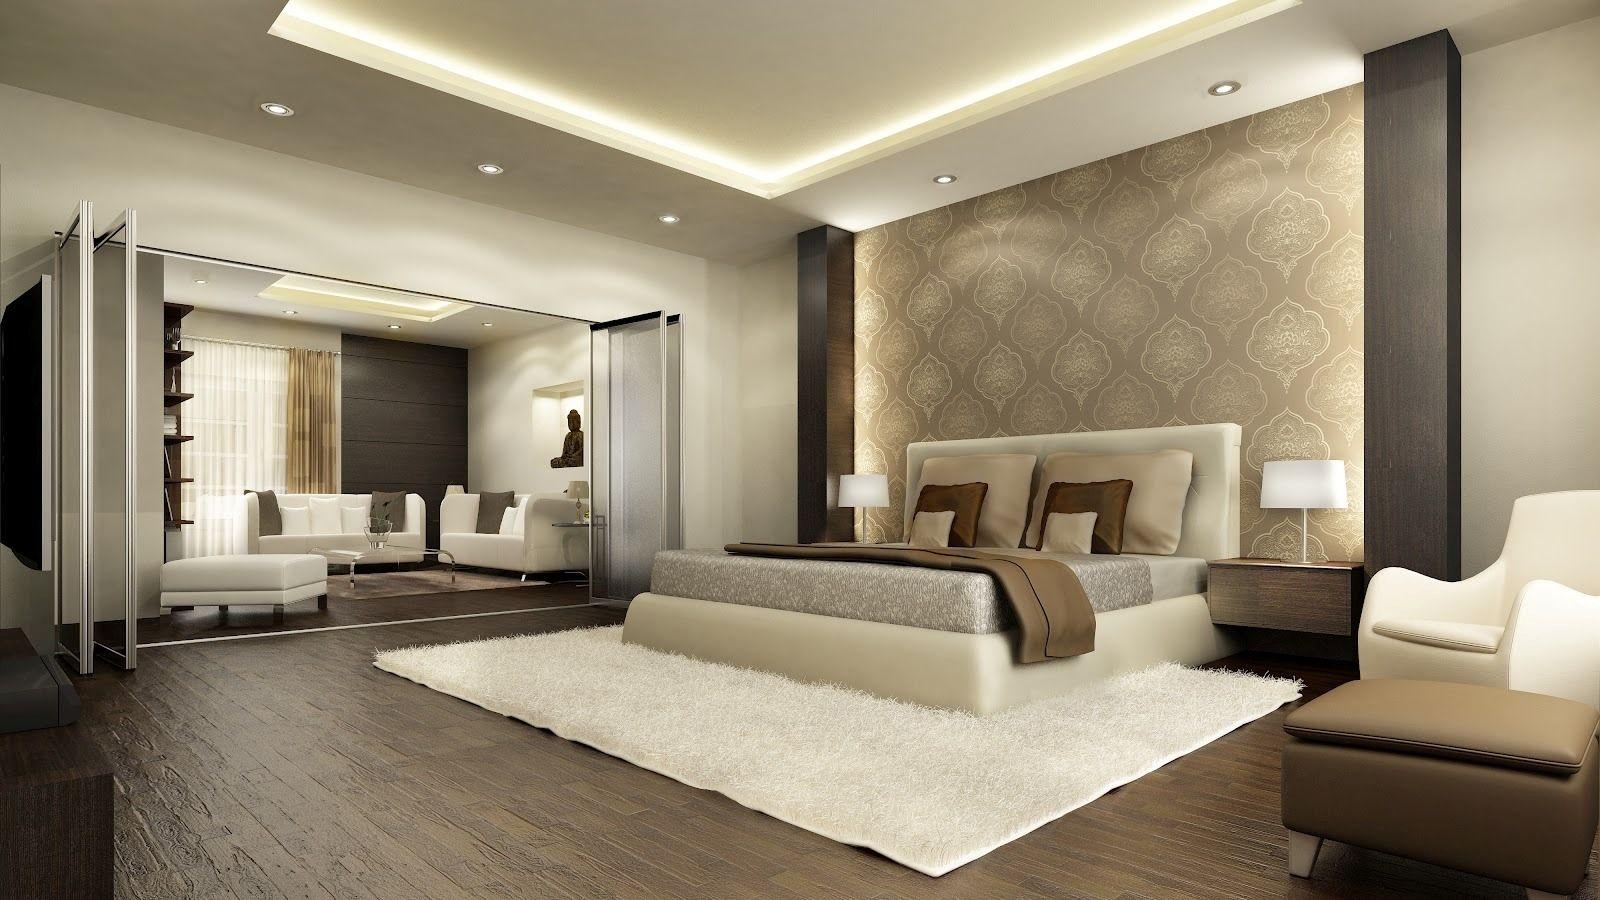 modern bedroom designs%0A Luxury Master Bedroom Interior Design